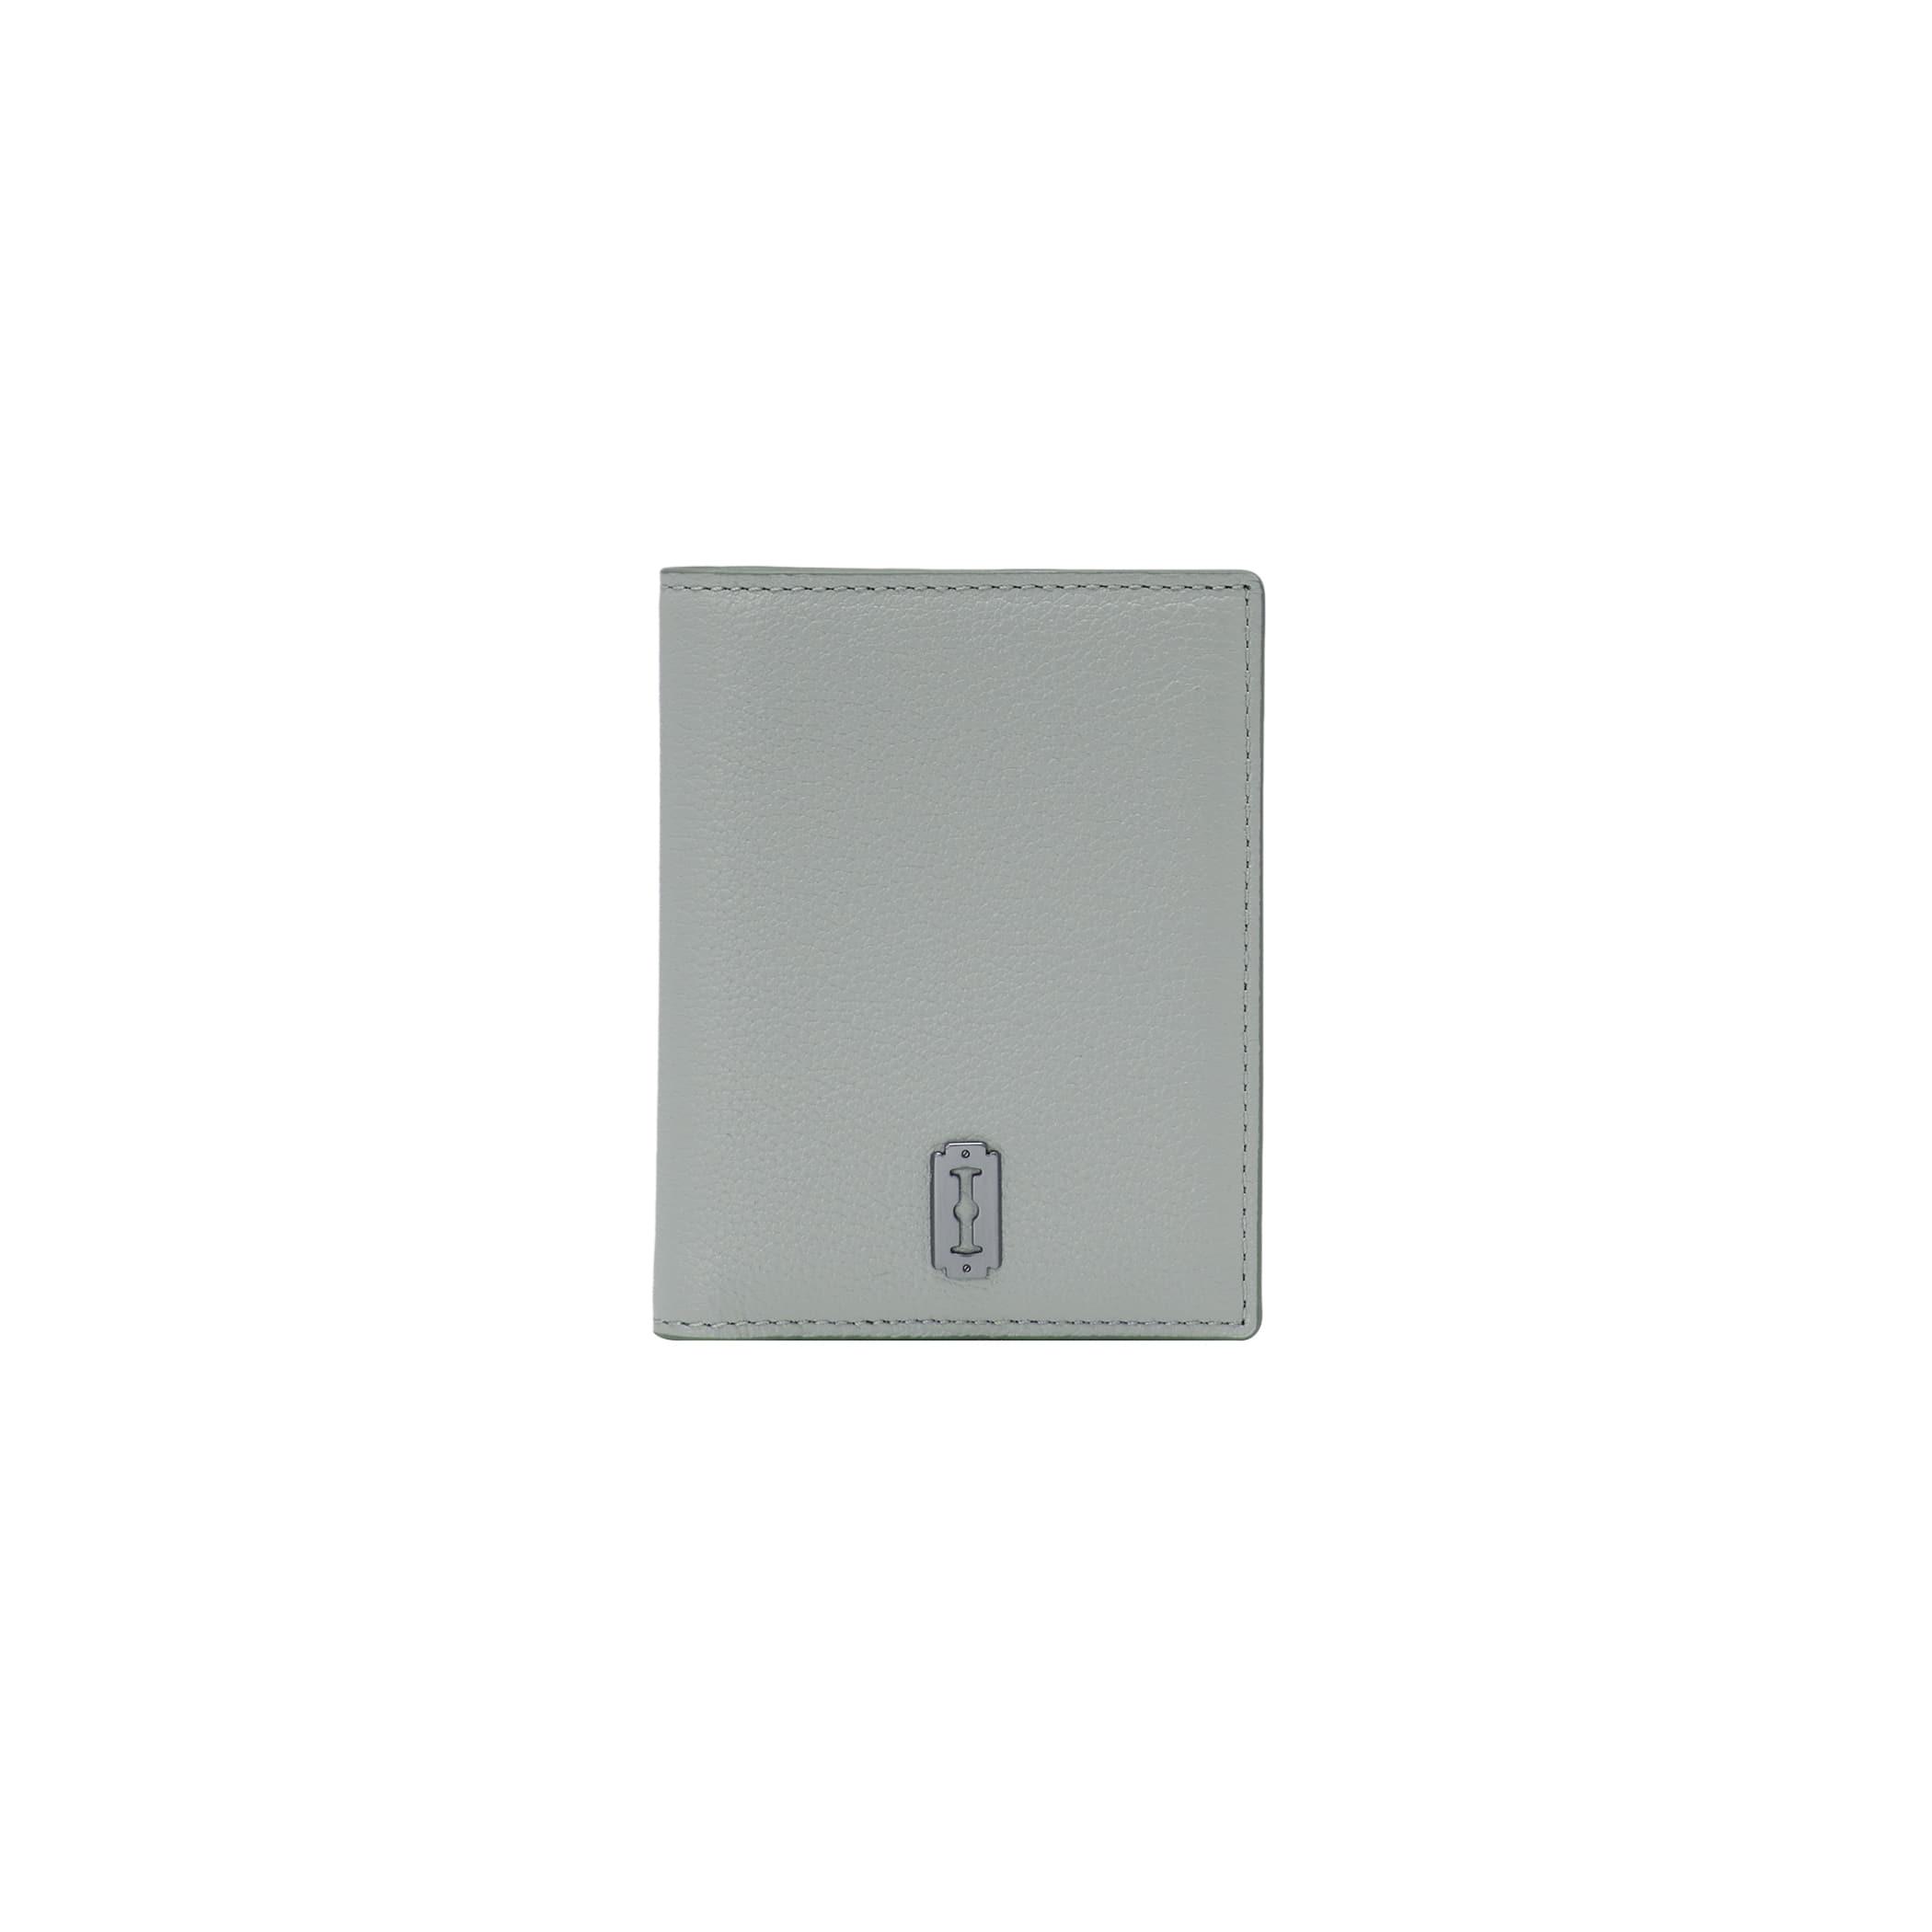 Occam Razor Folding Wallet (오캄 레이저 폴딩 지갑) Light grey